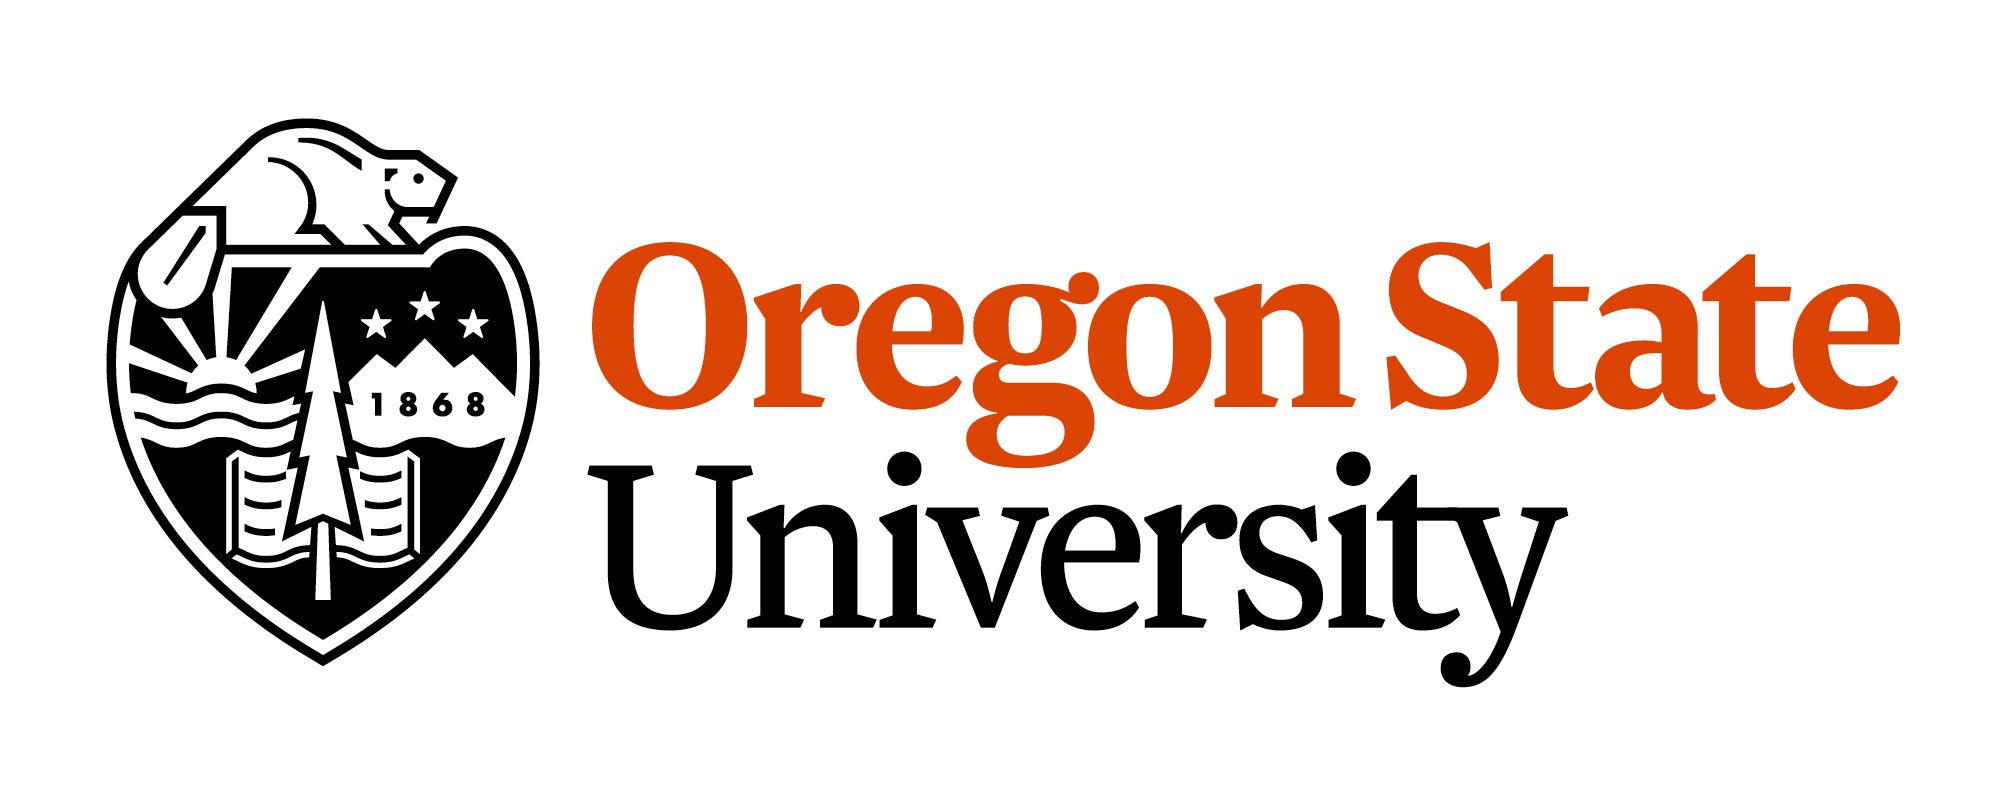 Edu Guest Post on Oregon State University - Oregonstate. edu DA87